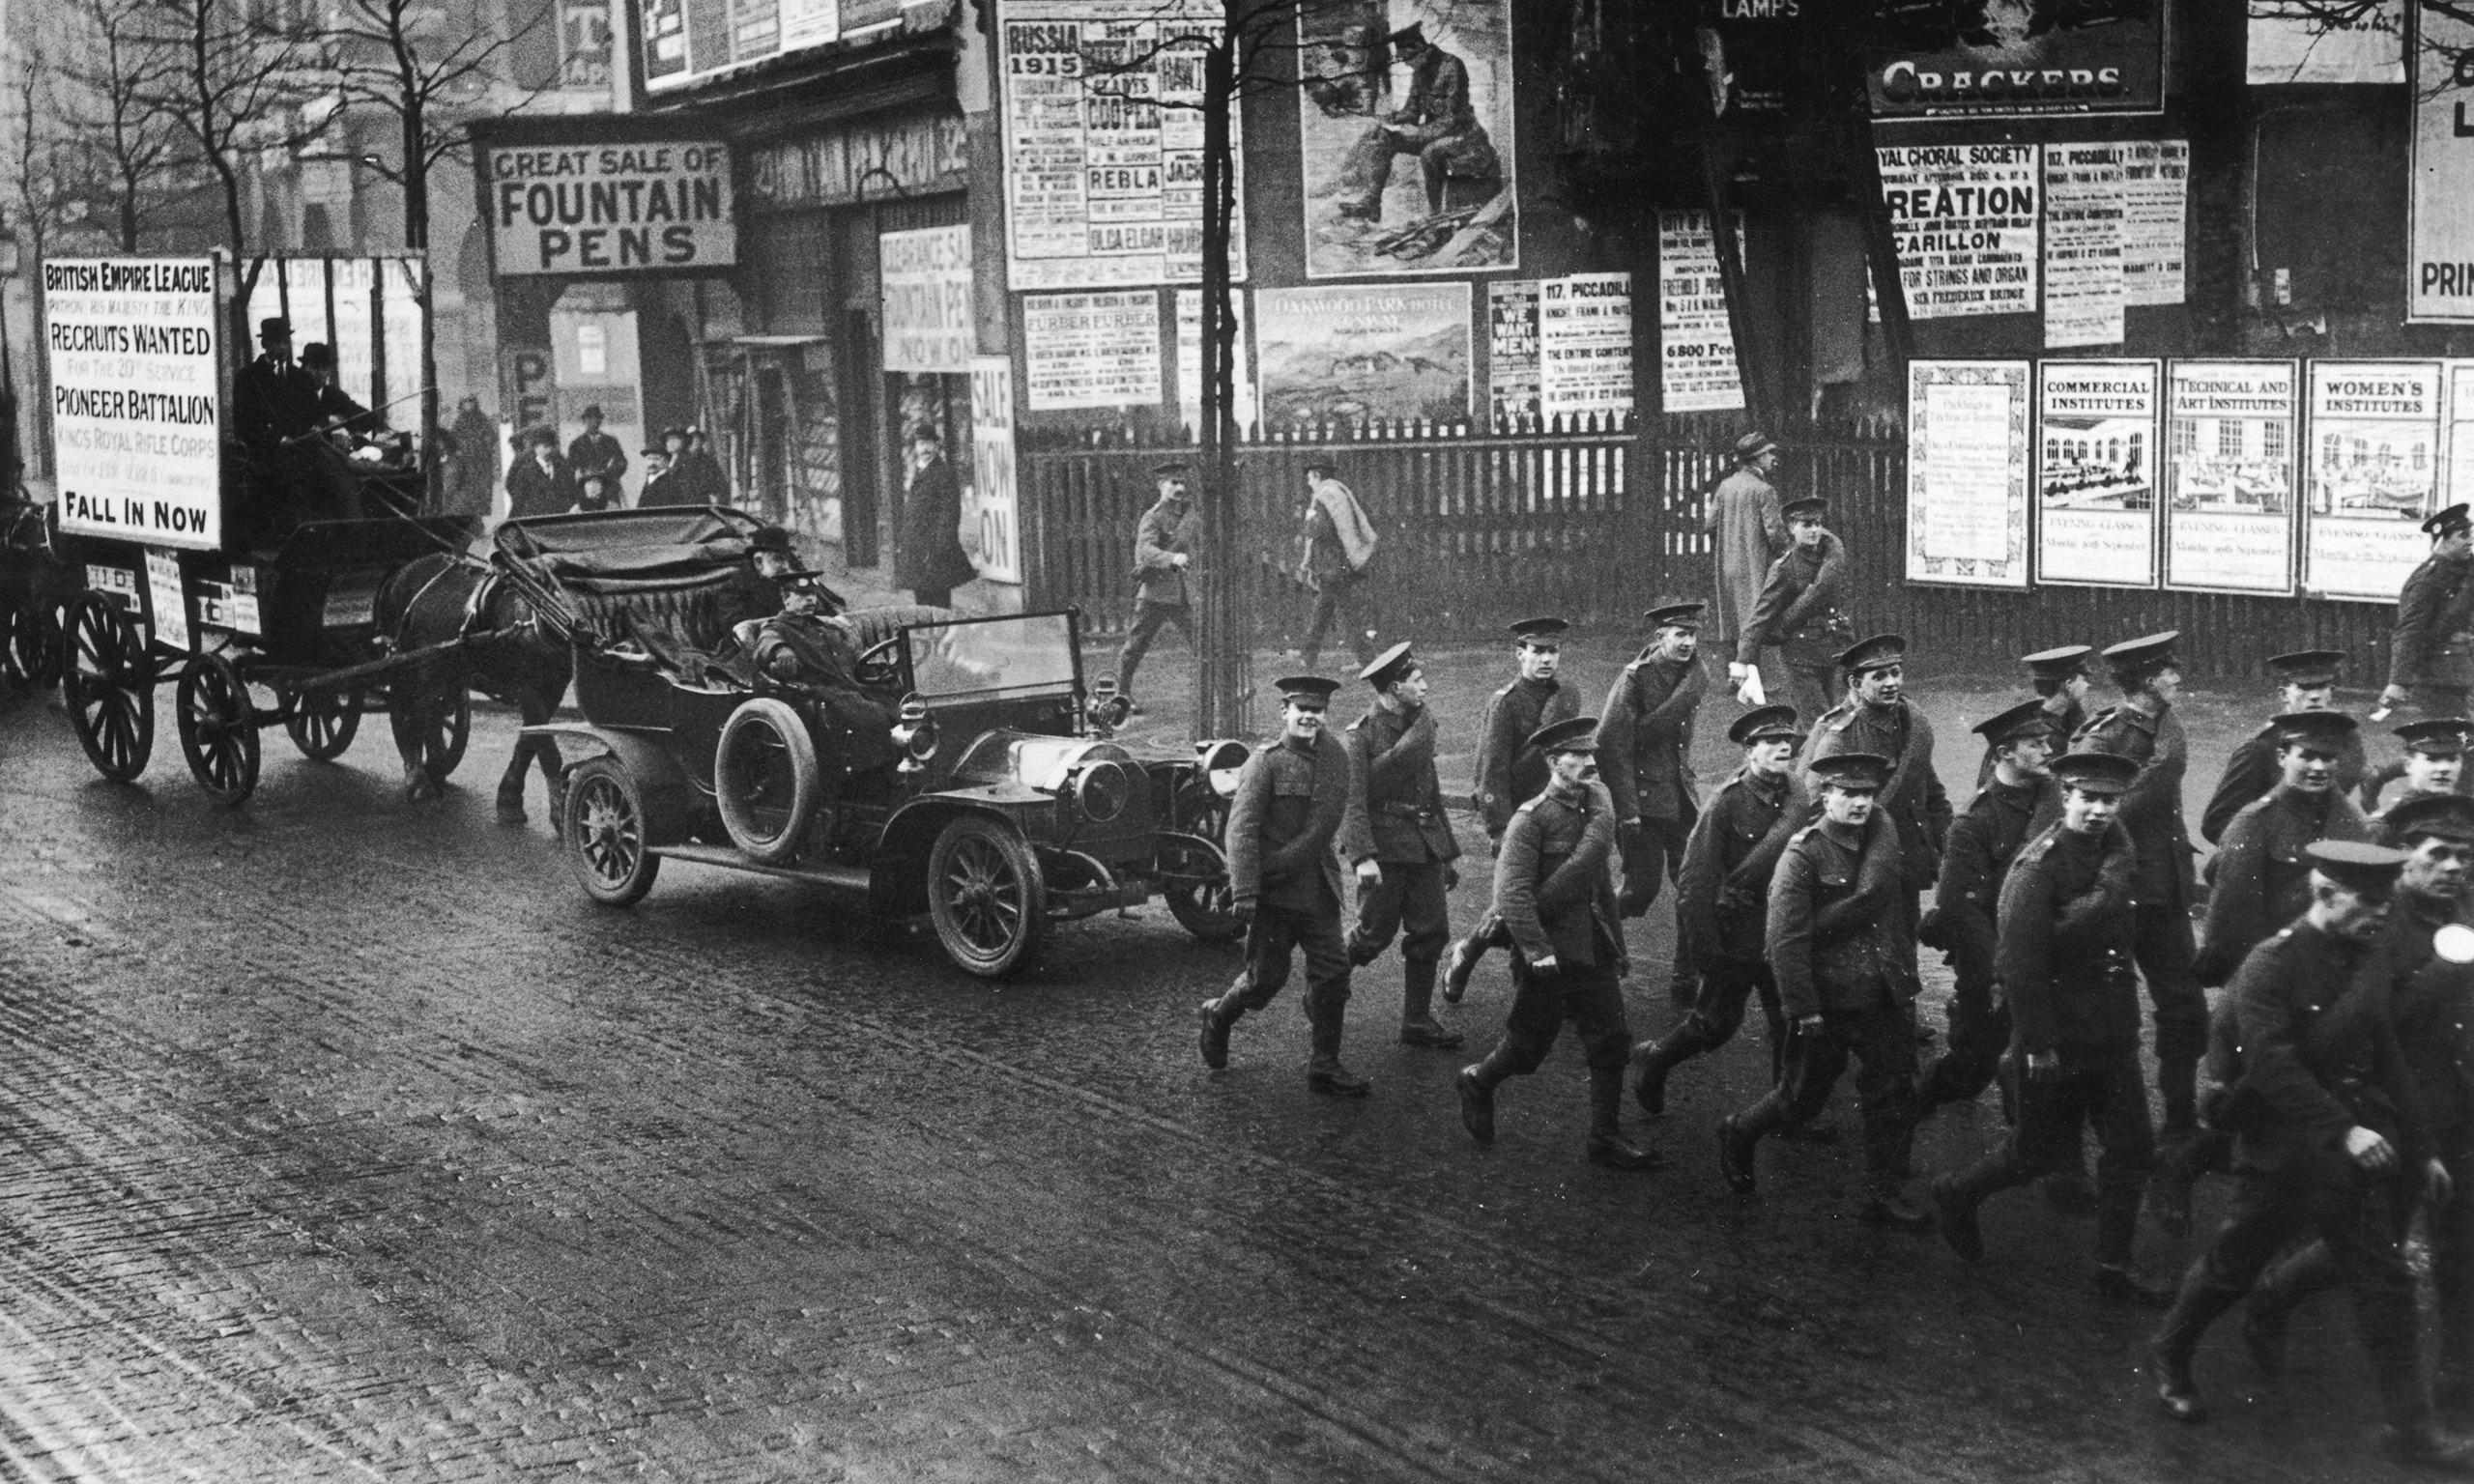 First World War Still No End In Sight By Frank Furedi